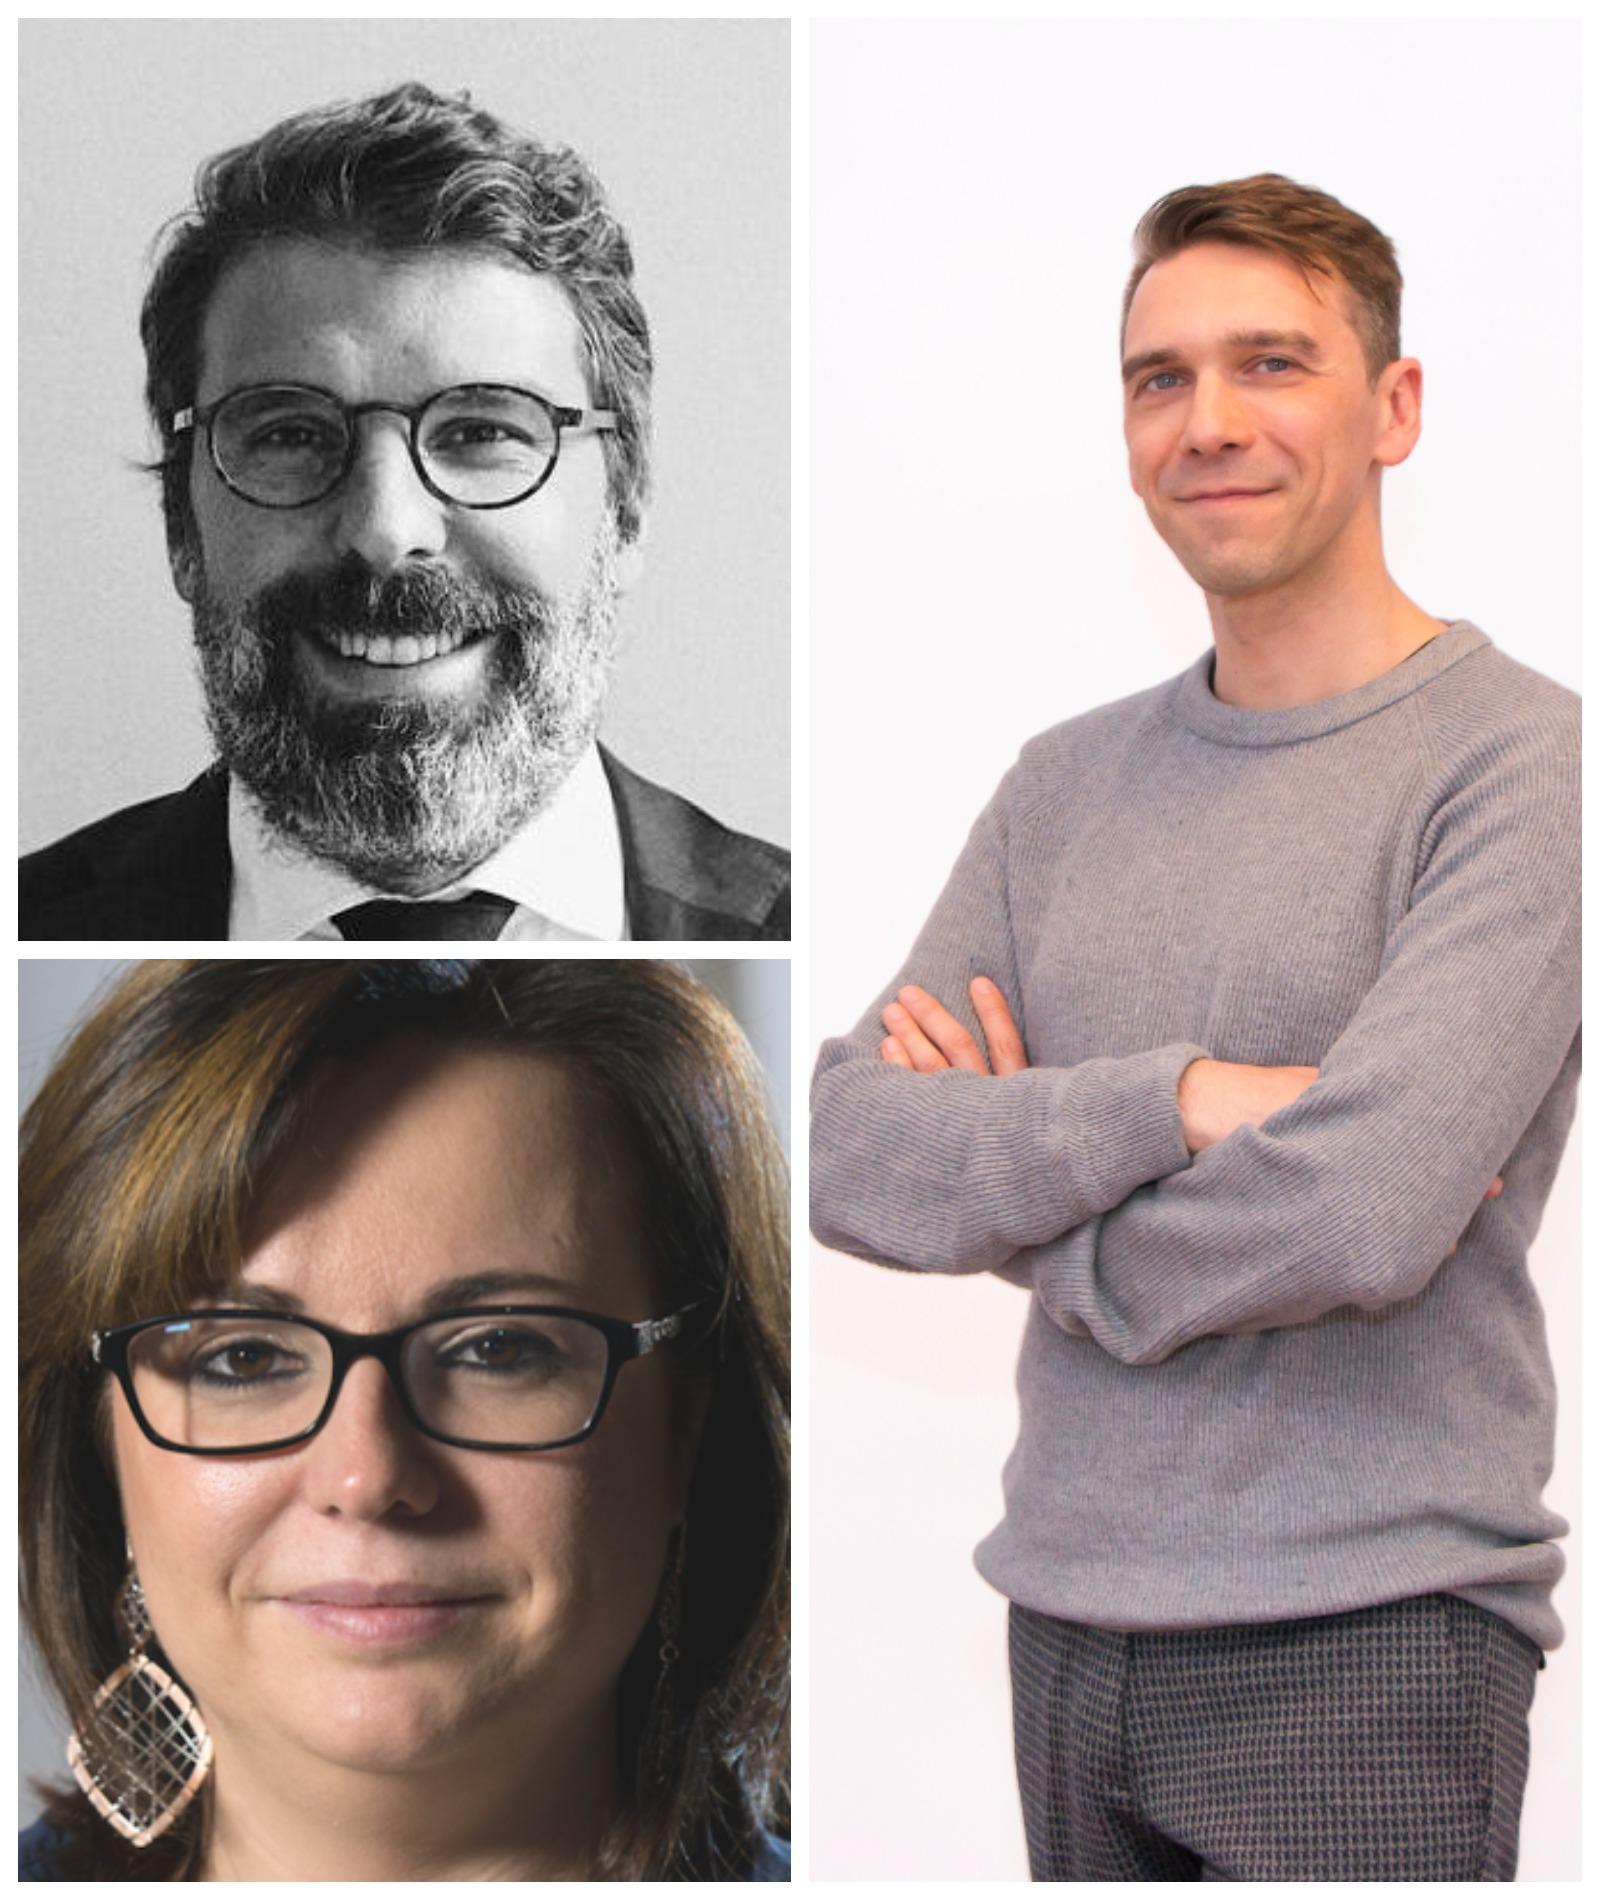 Enrico Torlaschi e Luca Comino, E3, e Sabrina Biasio, VRZONE